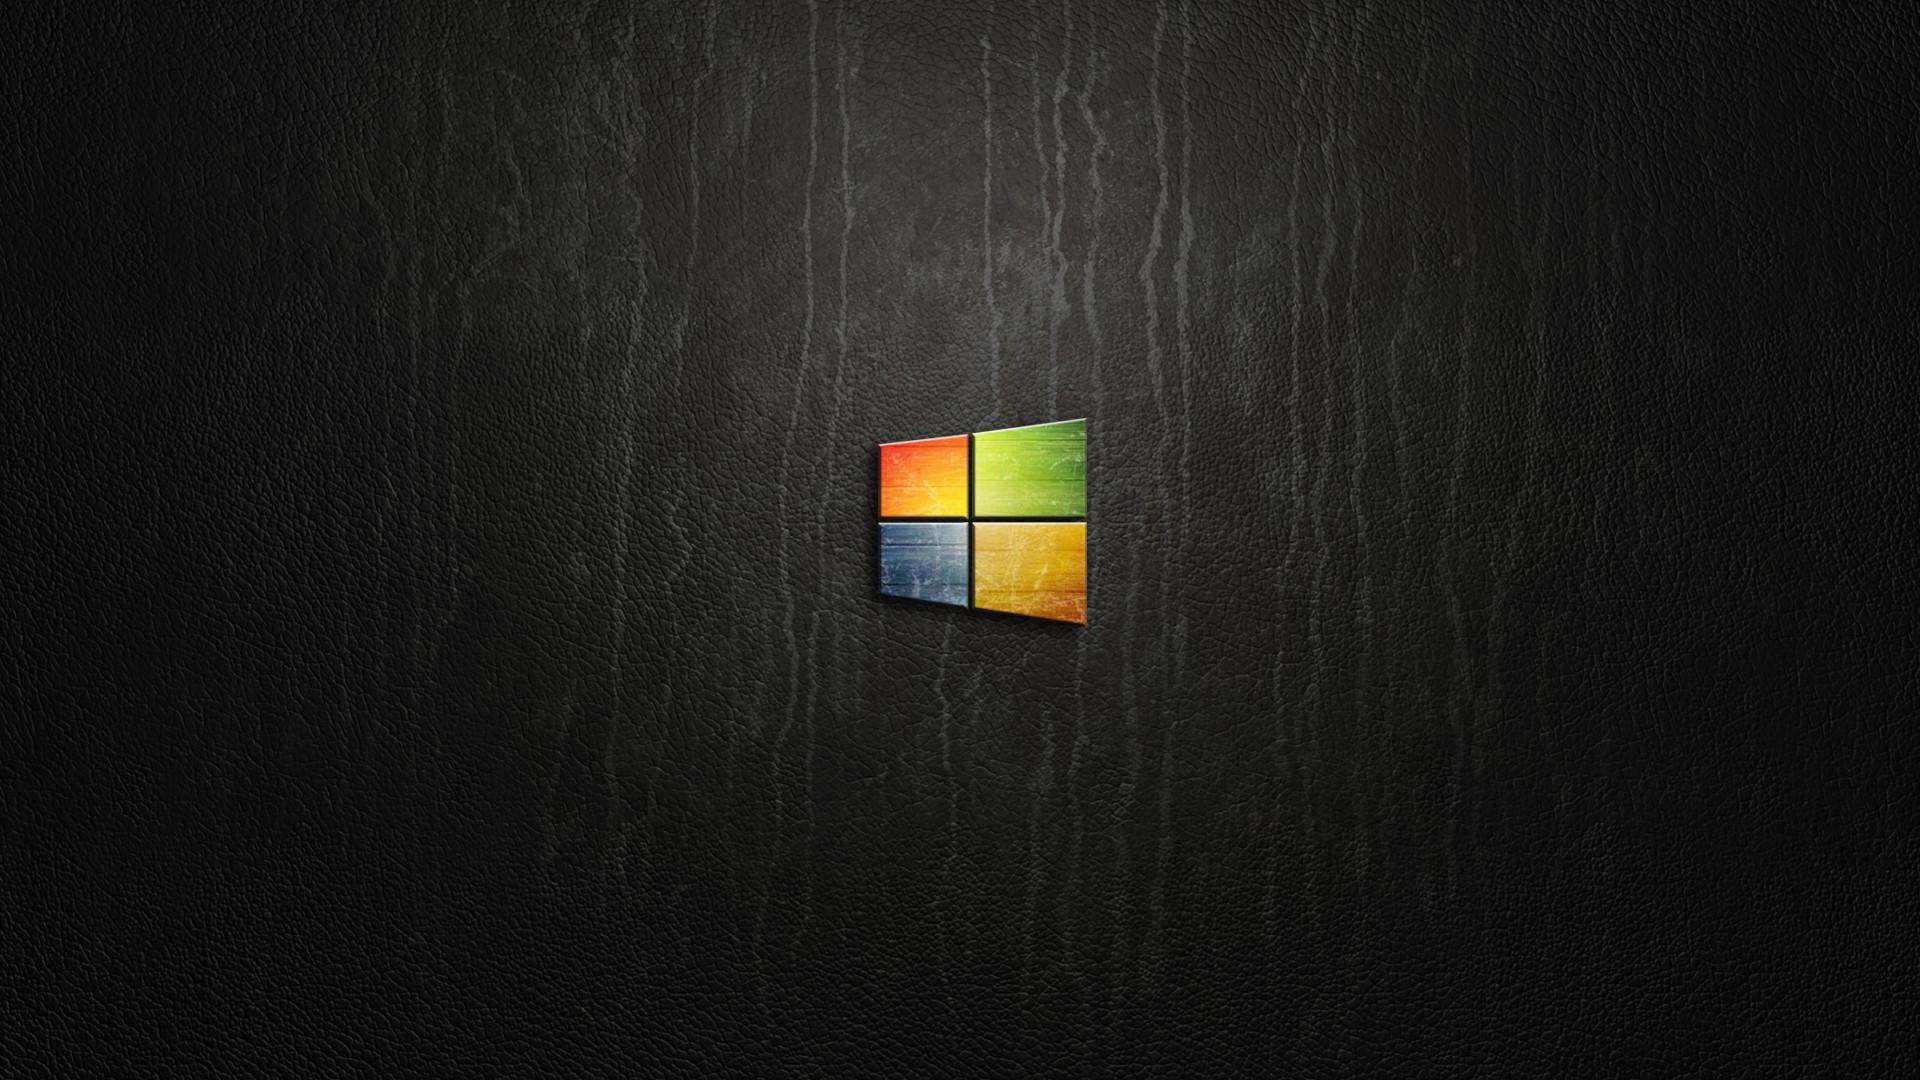 Windows 10 Wallpapers 10